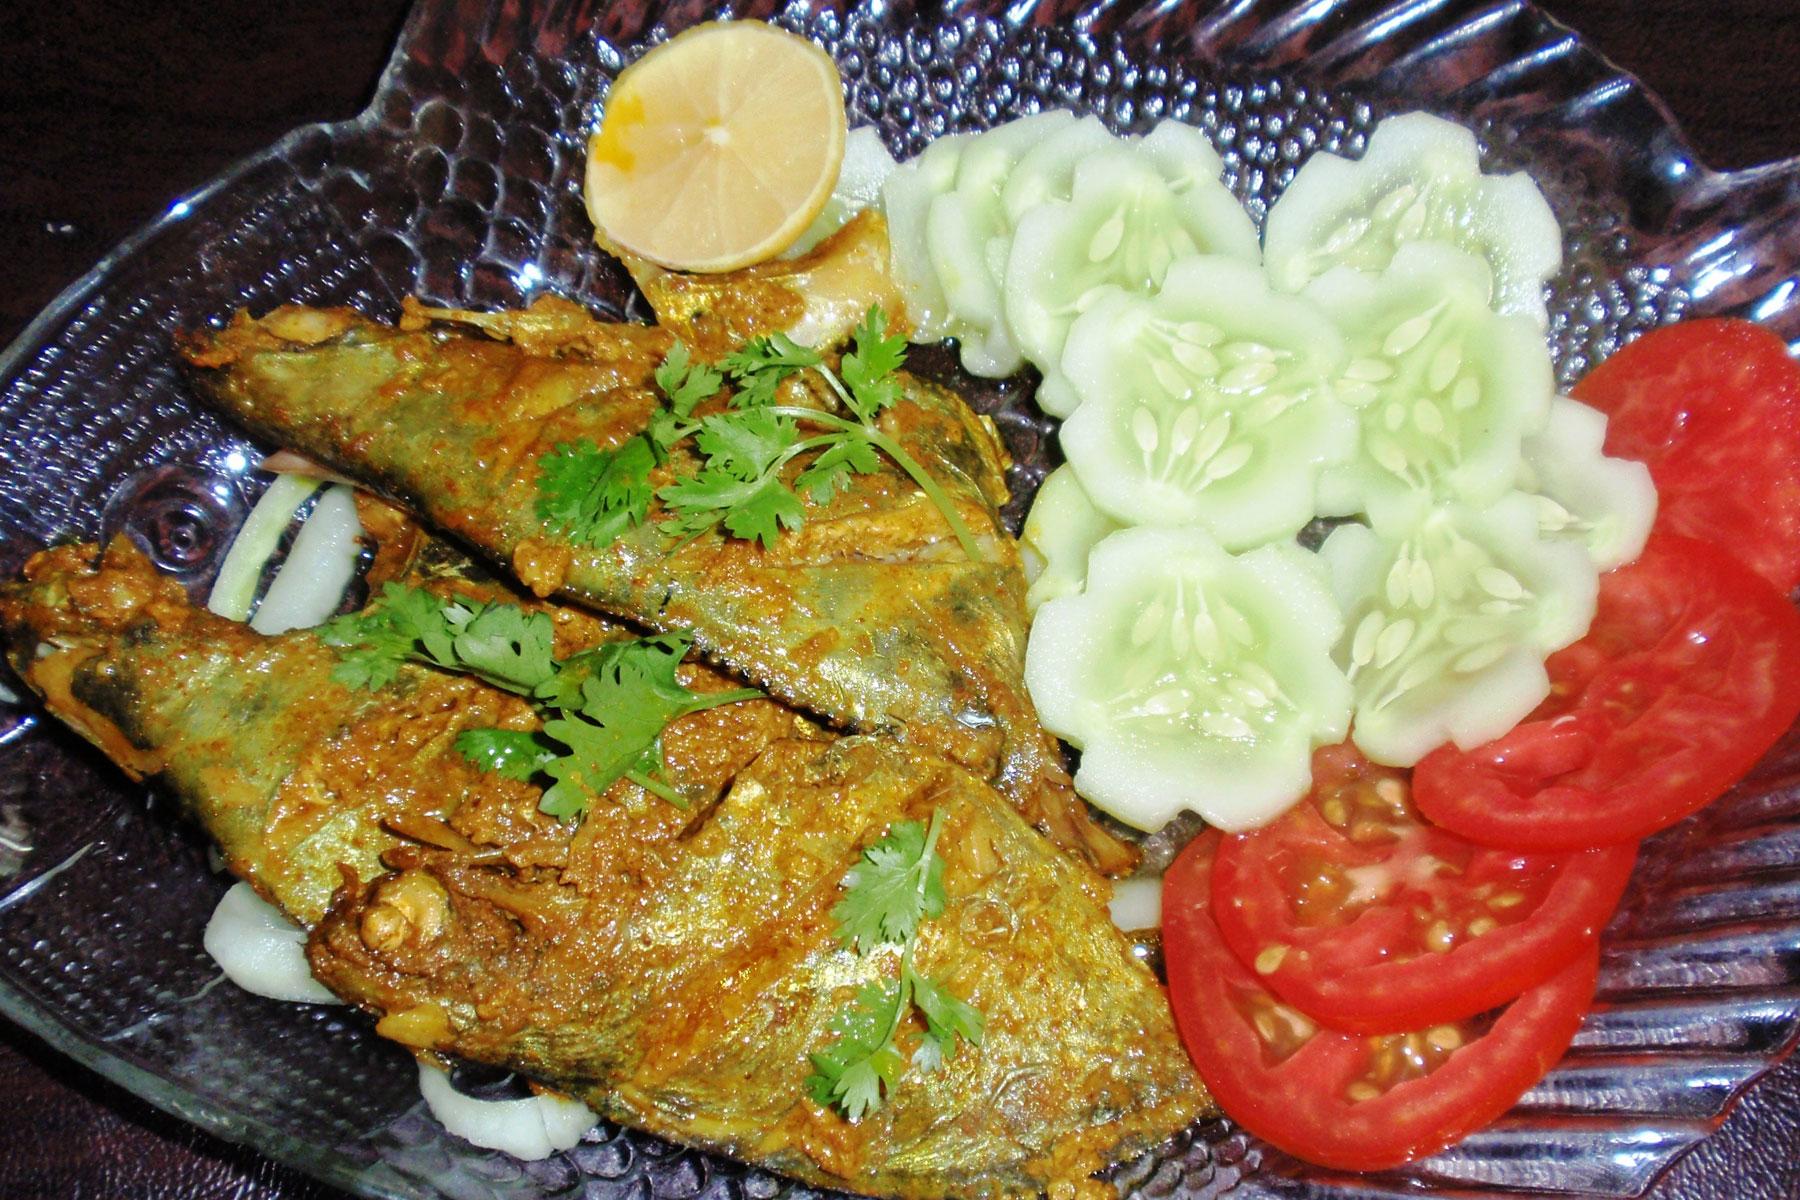 Food2 fish sfw